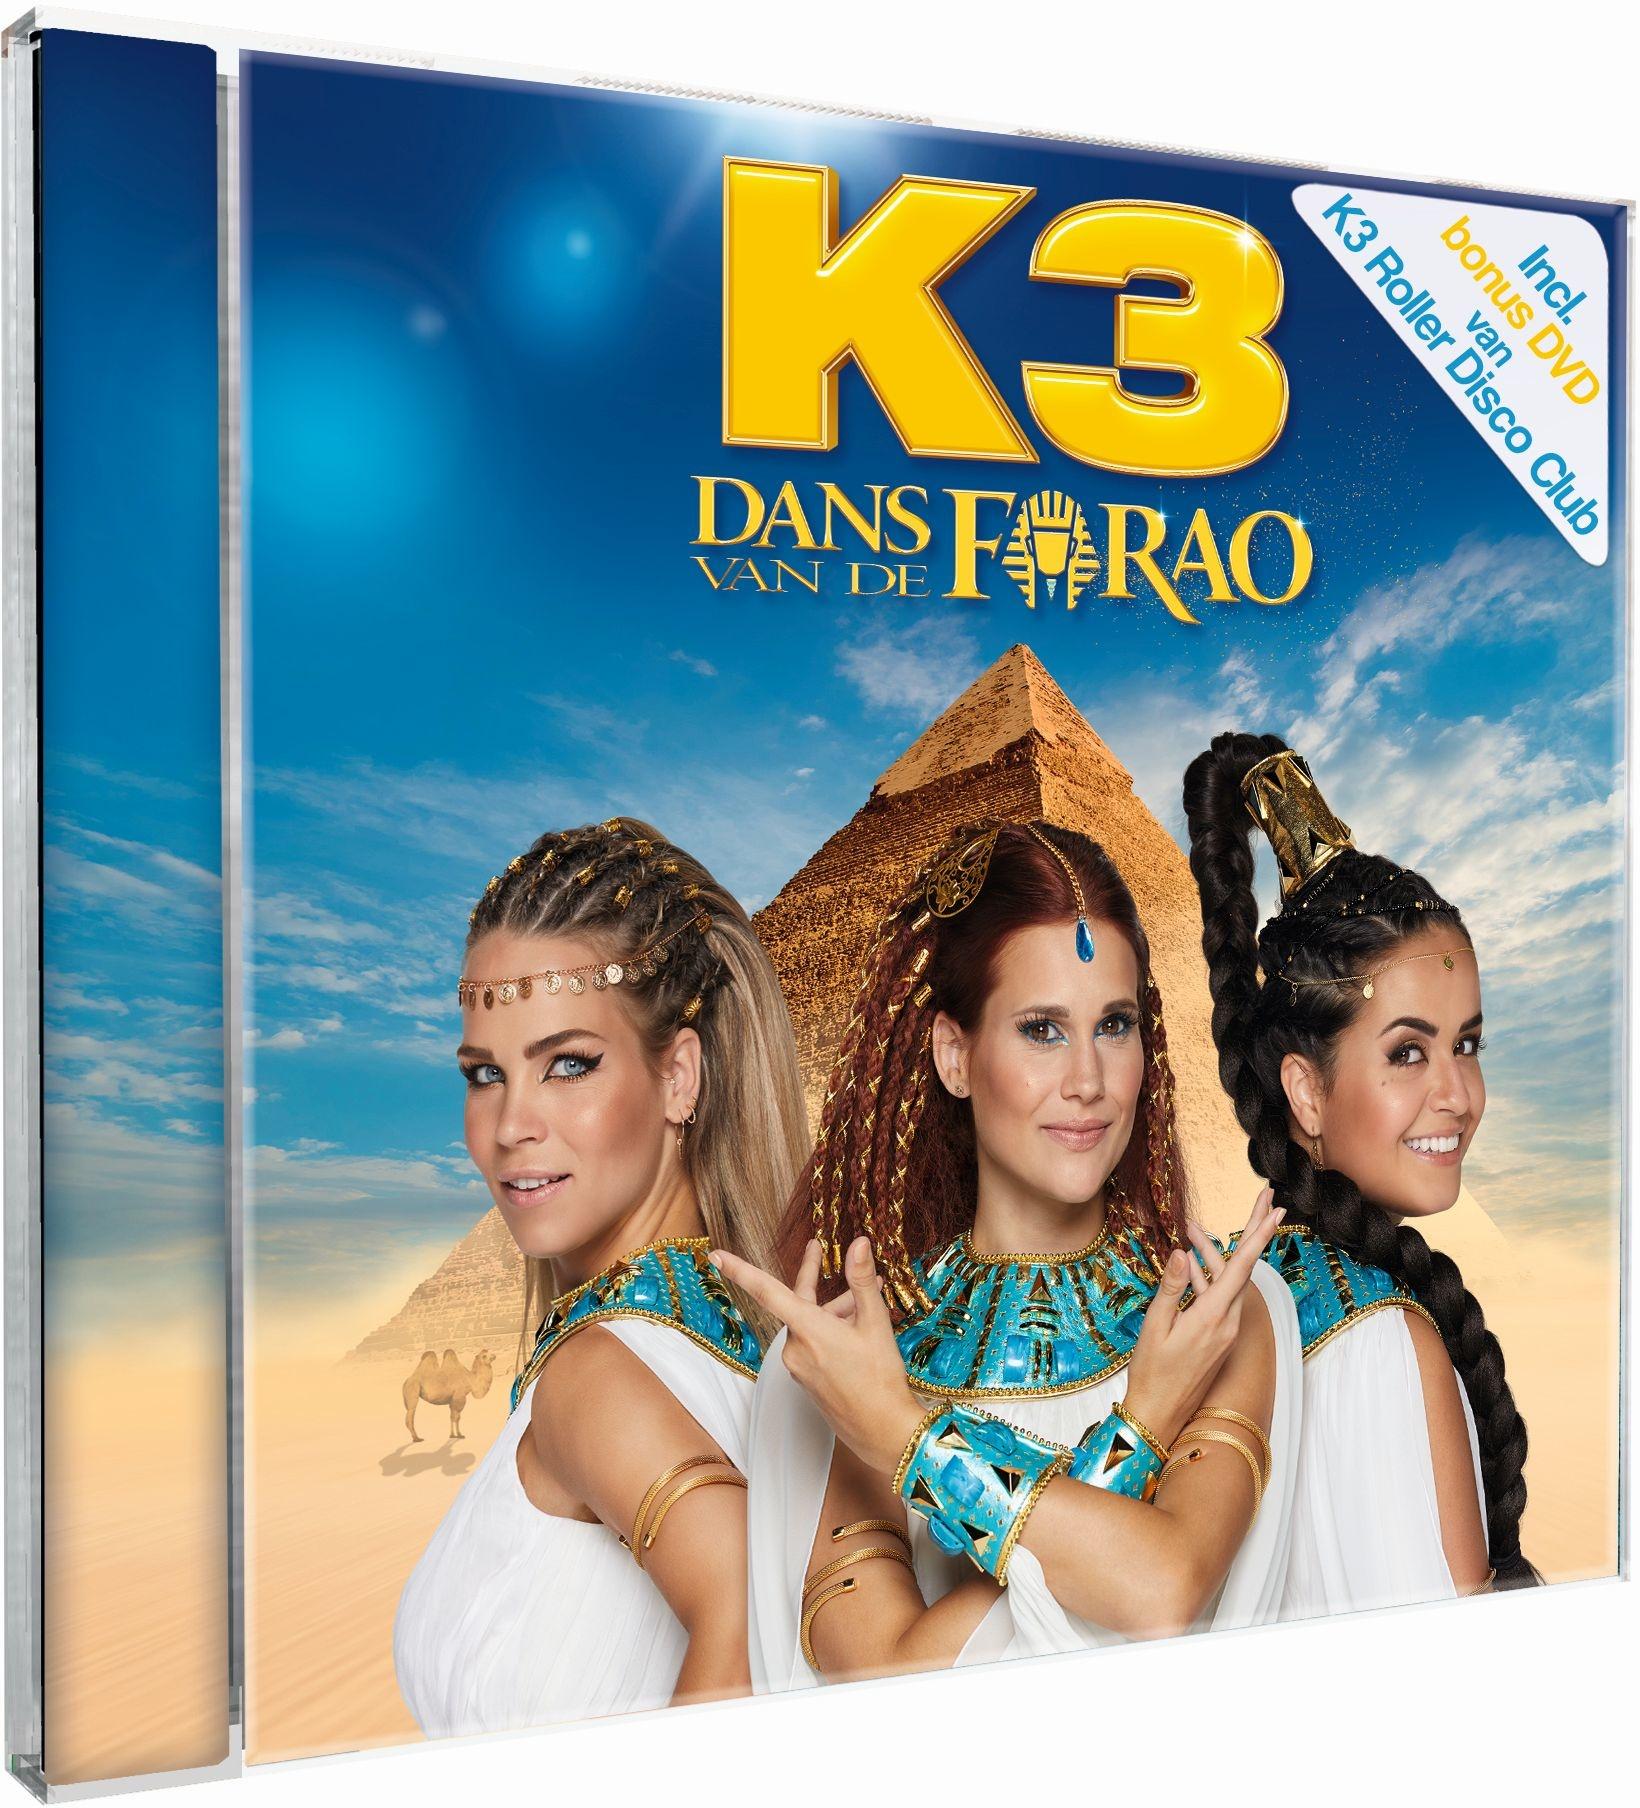 K3 CD - Danse du Pharaon